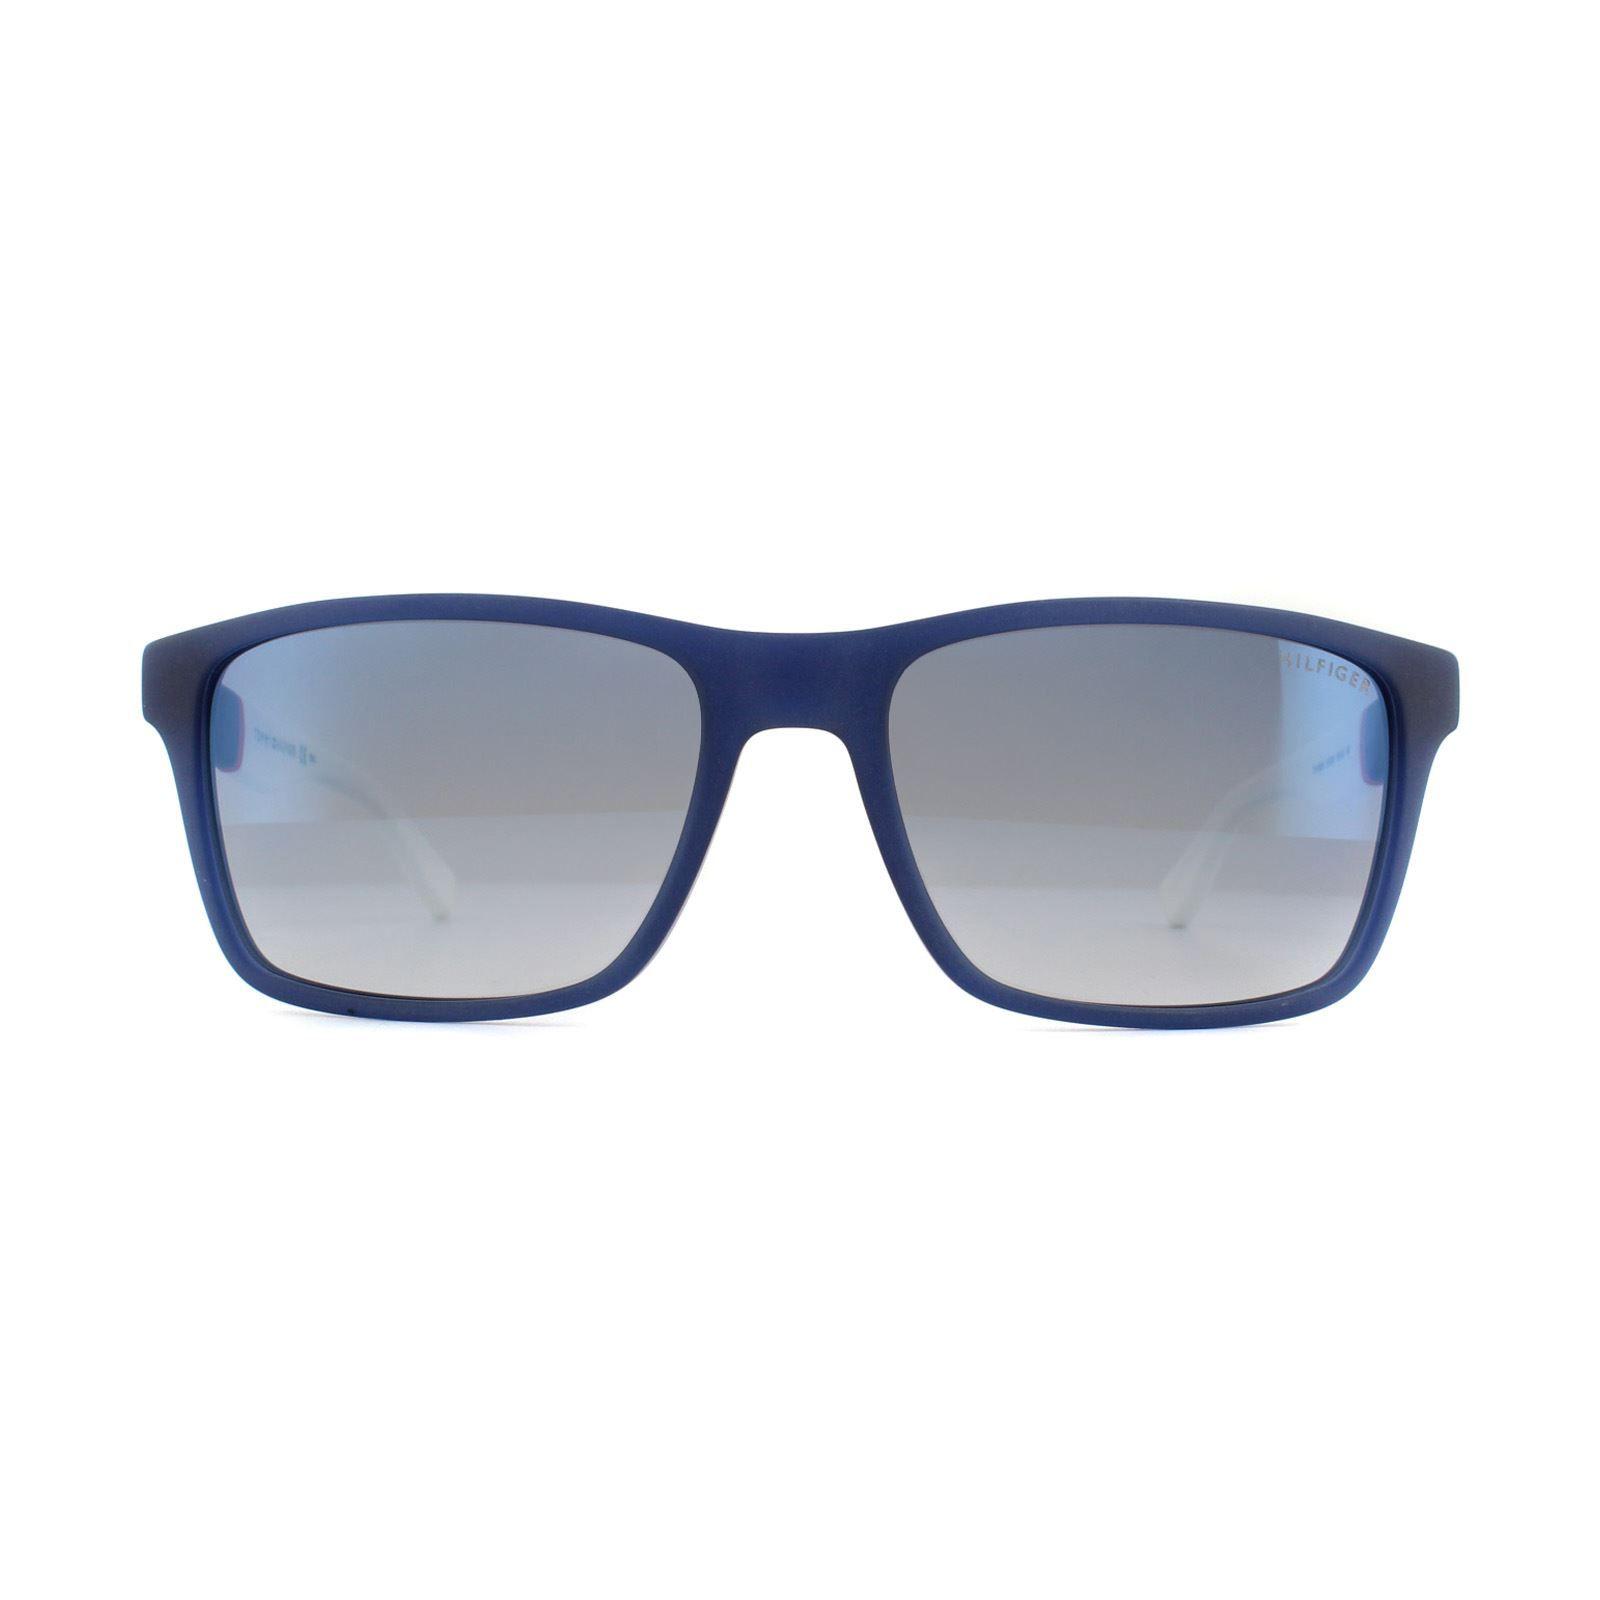 Tommy Hilfiger Sunglasses TH 1405/S H1O DK Blue Red White Light Blue Sky Flash